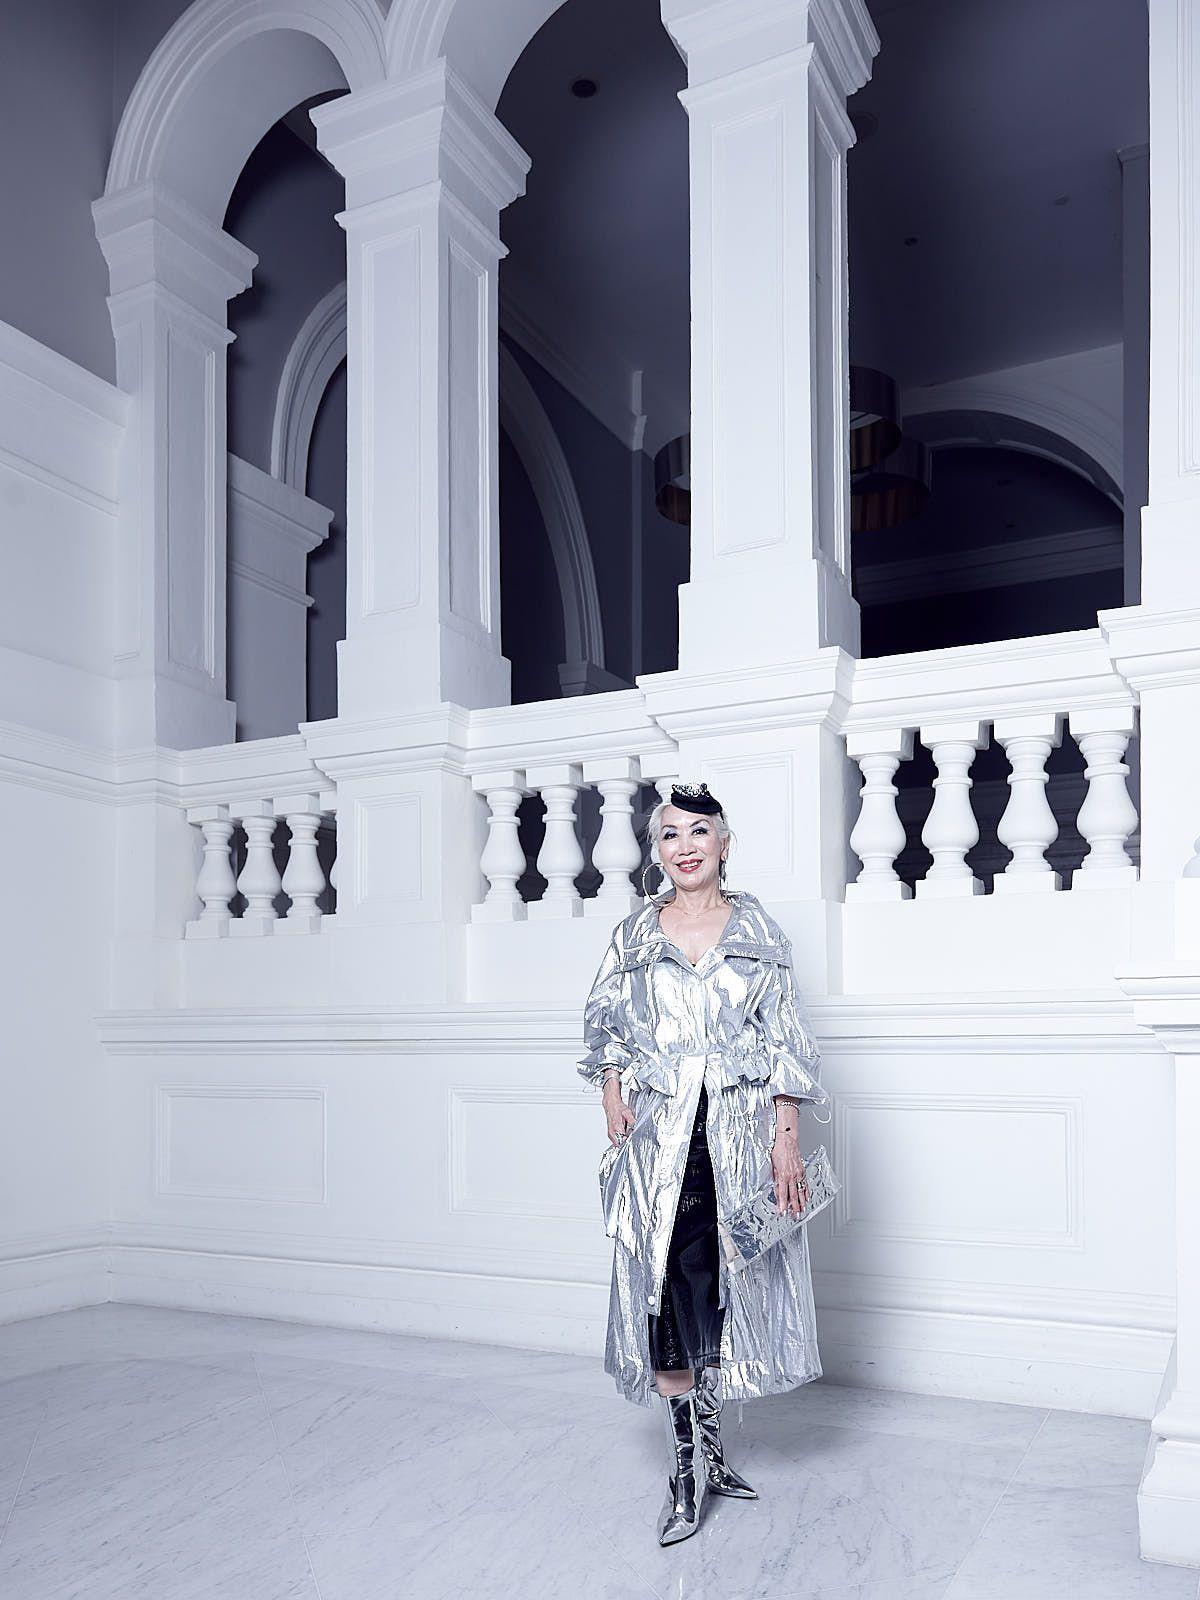 Peggy Jeffs in Wai Yang & Balenciaga